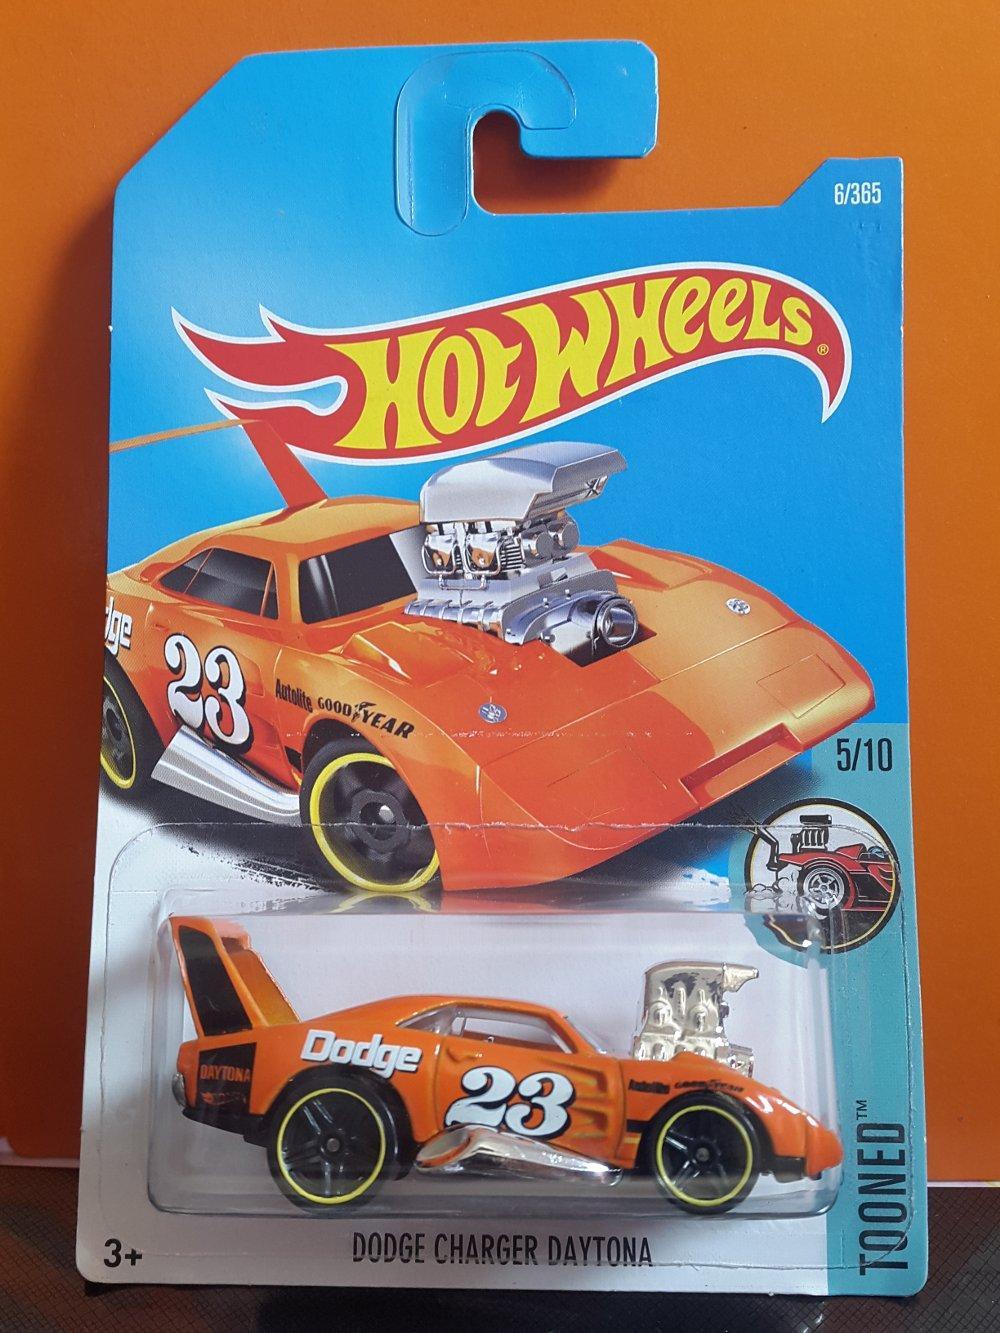 Dodge Charger Daytona Goodyear orange colour Hotwheels # Favorit Toys favorit_toys